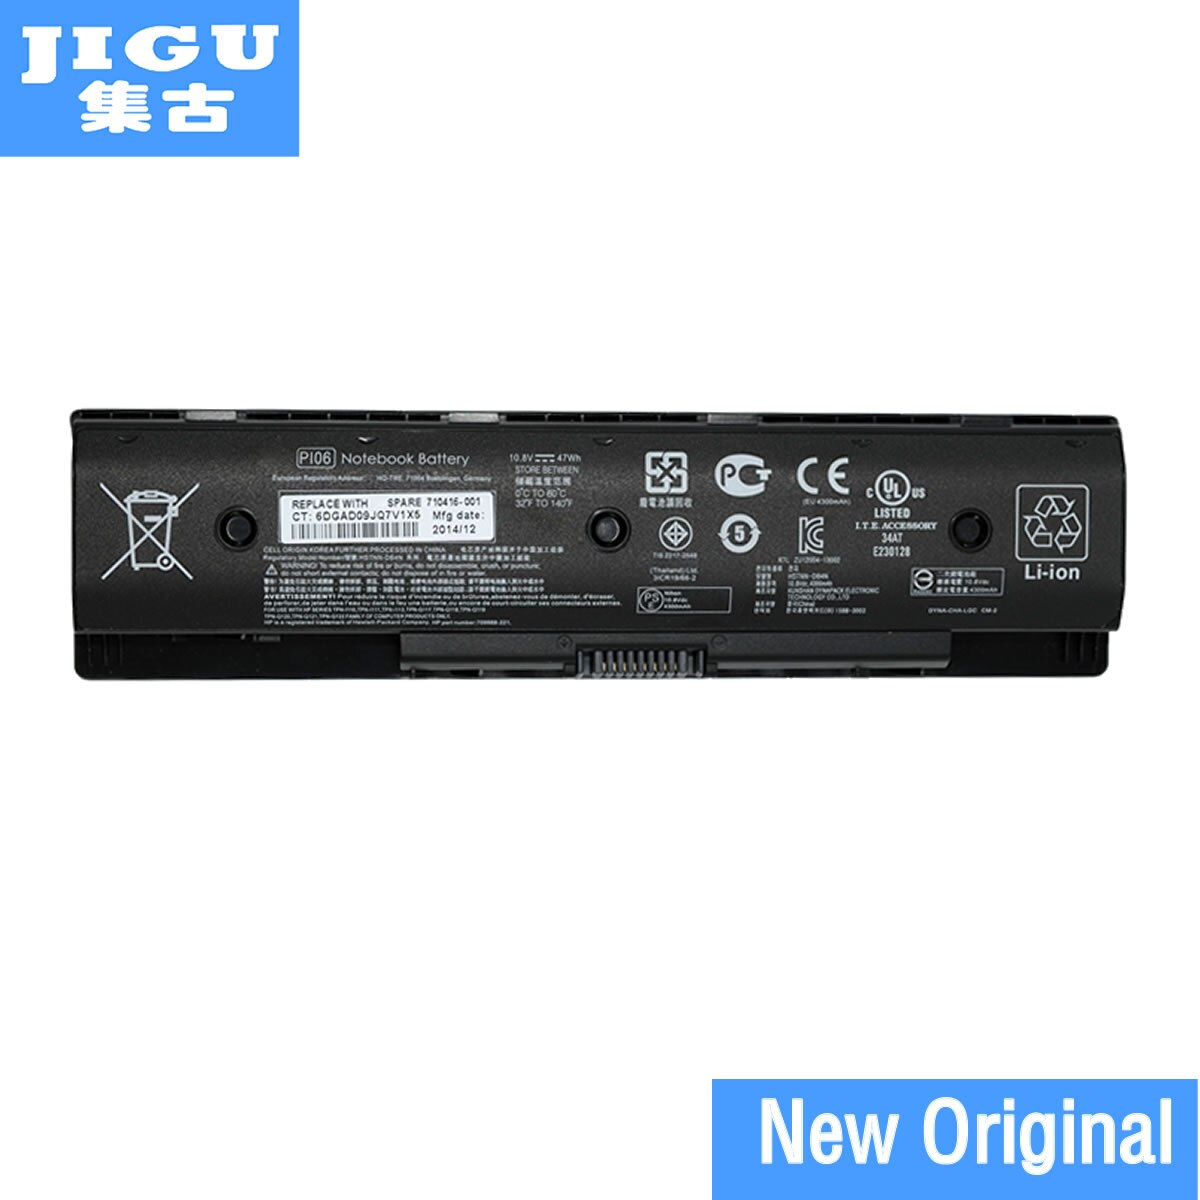 JIGU PI06XL PI09 PIO6 Q117 Оригинальный аккумулятор для ноутбука HP для зависти 14 15 17 для павильона 14 14t 14z 15 15t 15z 17t